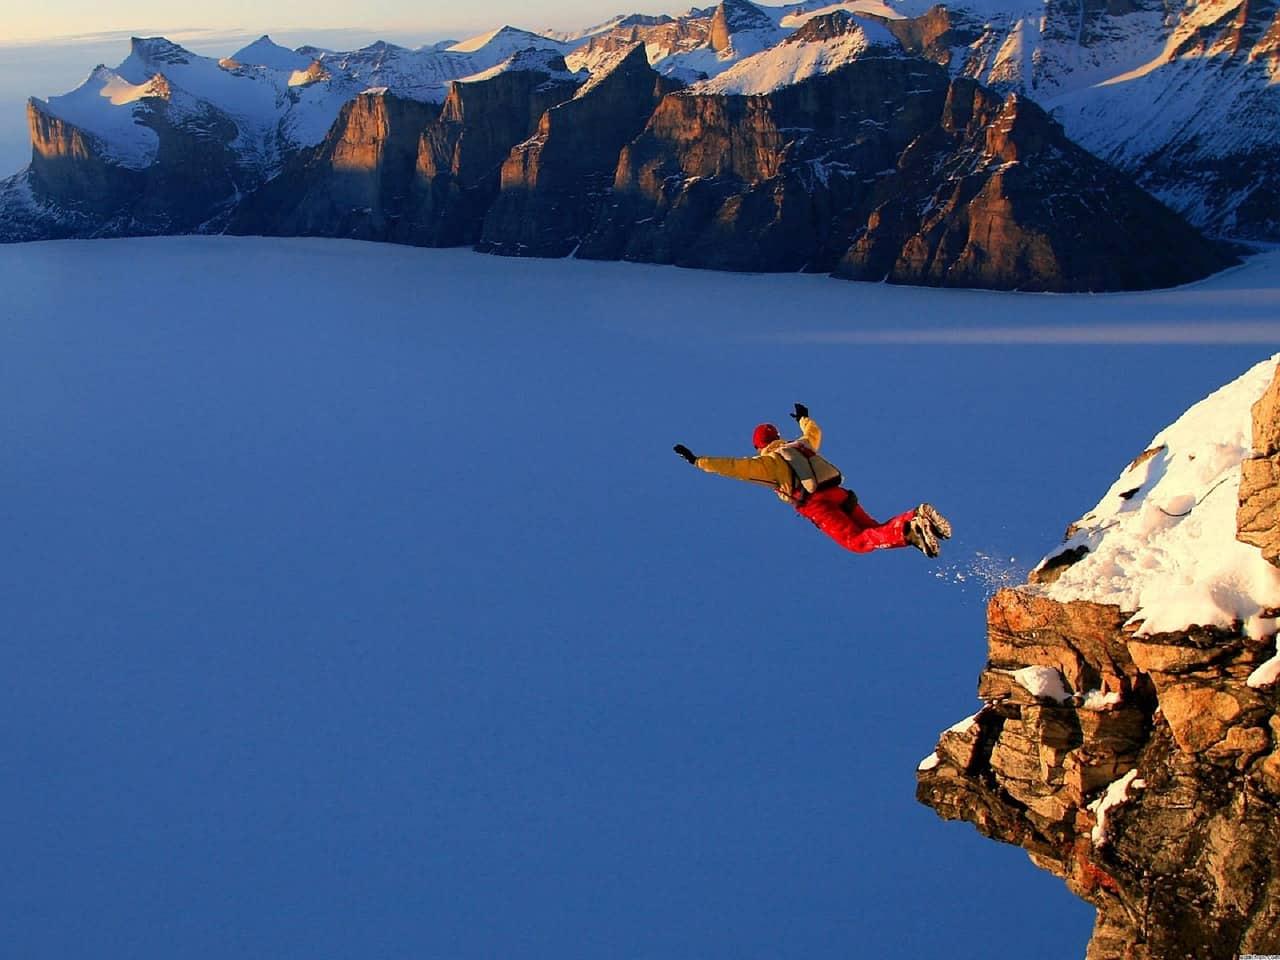 Salto BASE, disciplina extrema del paracaidismo